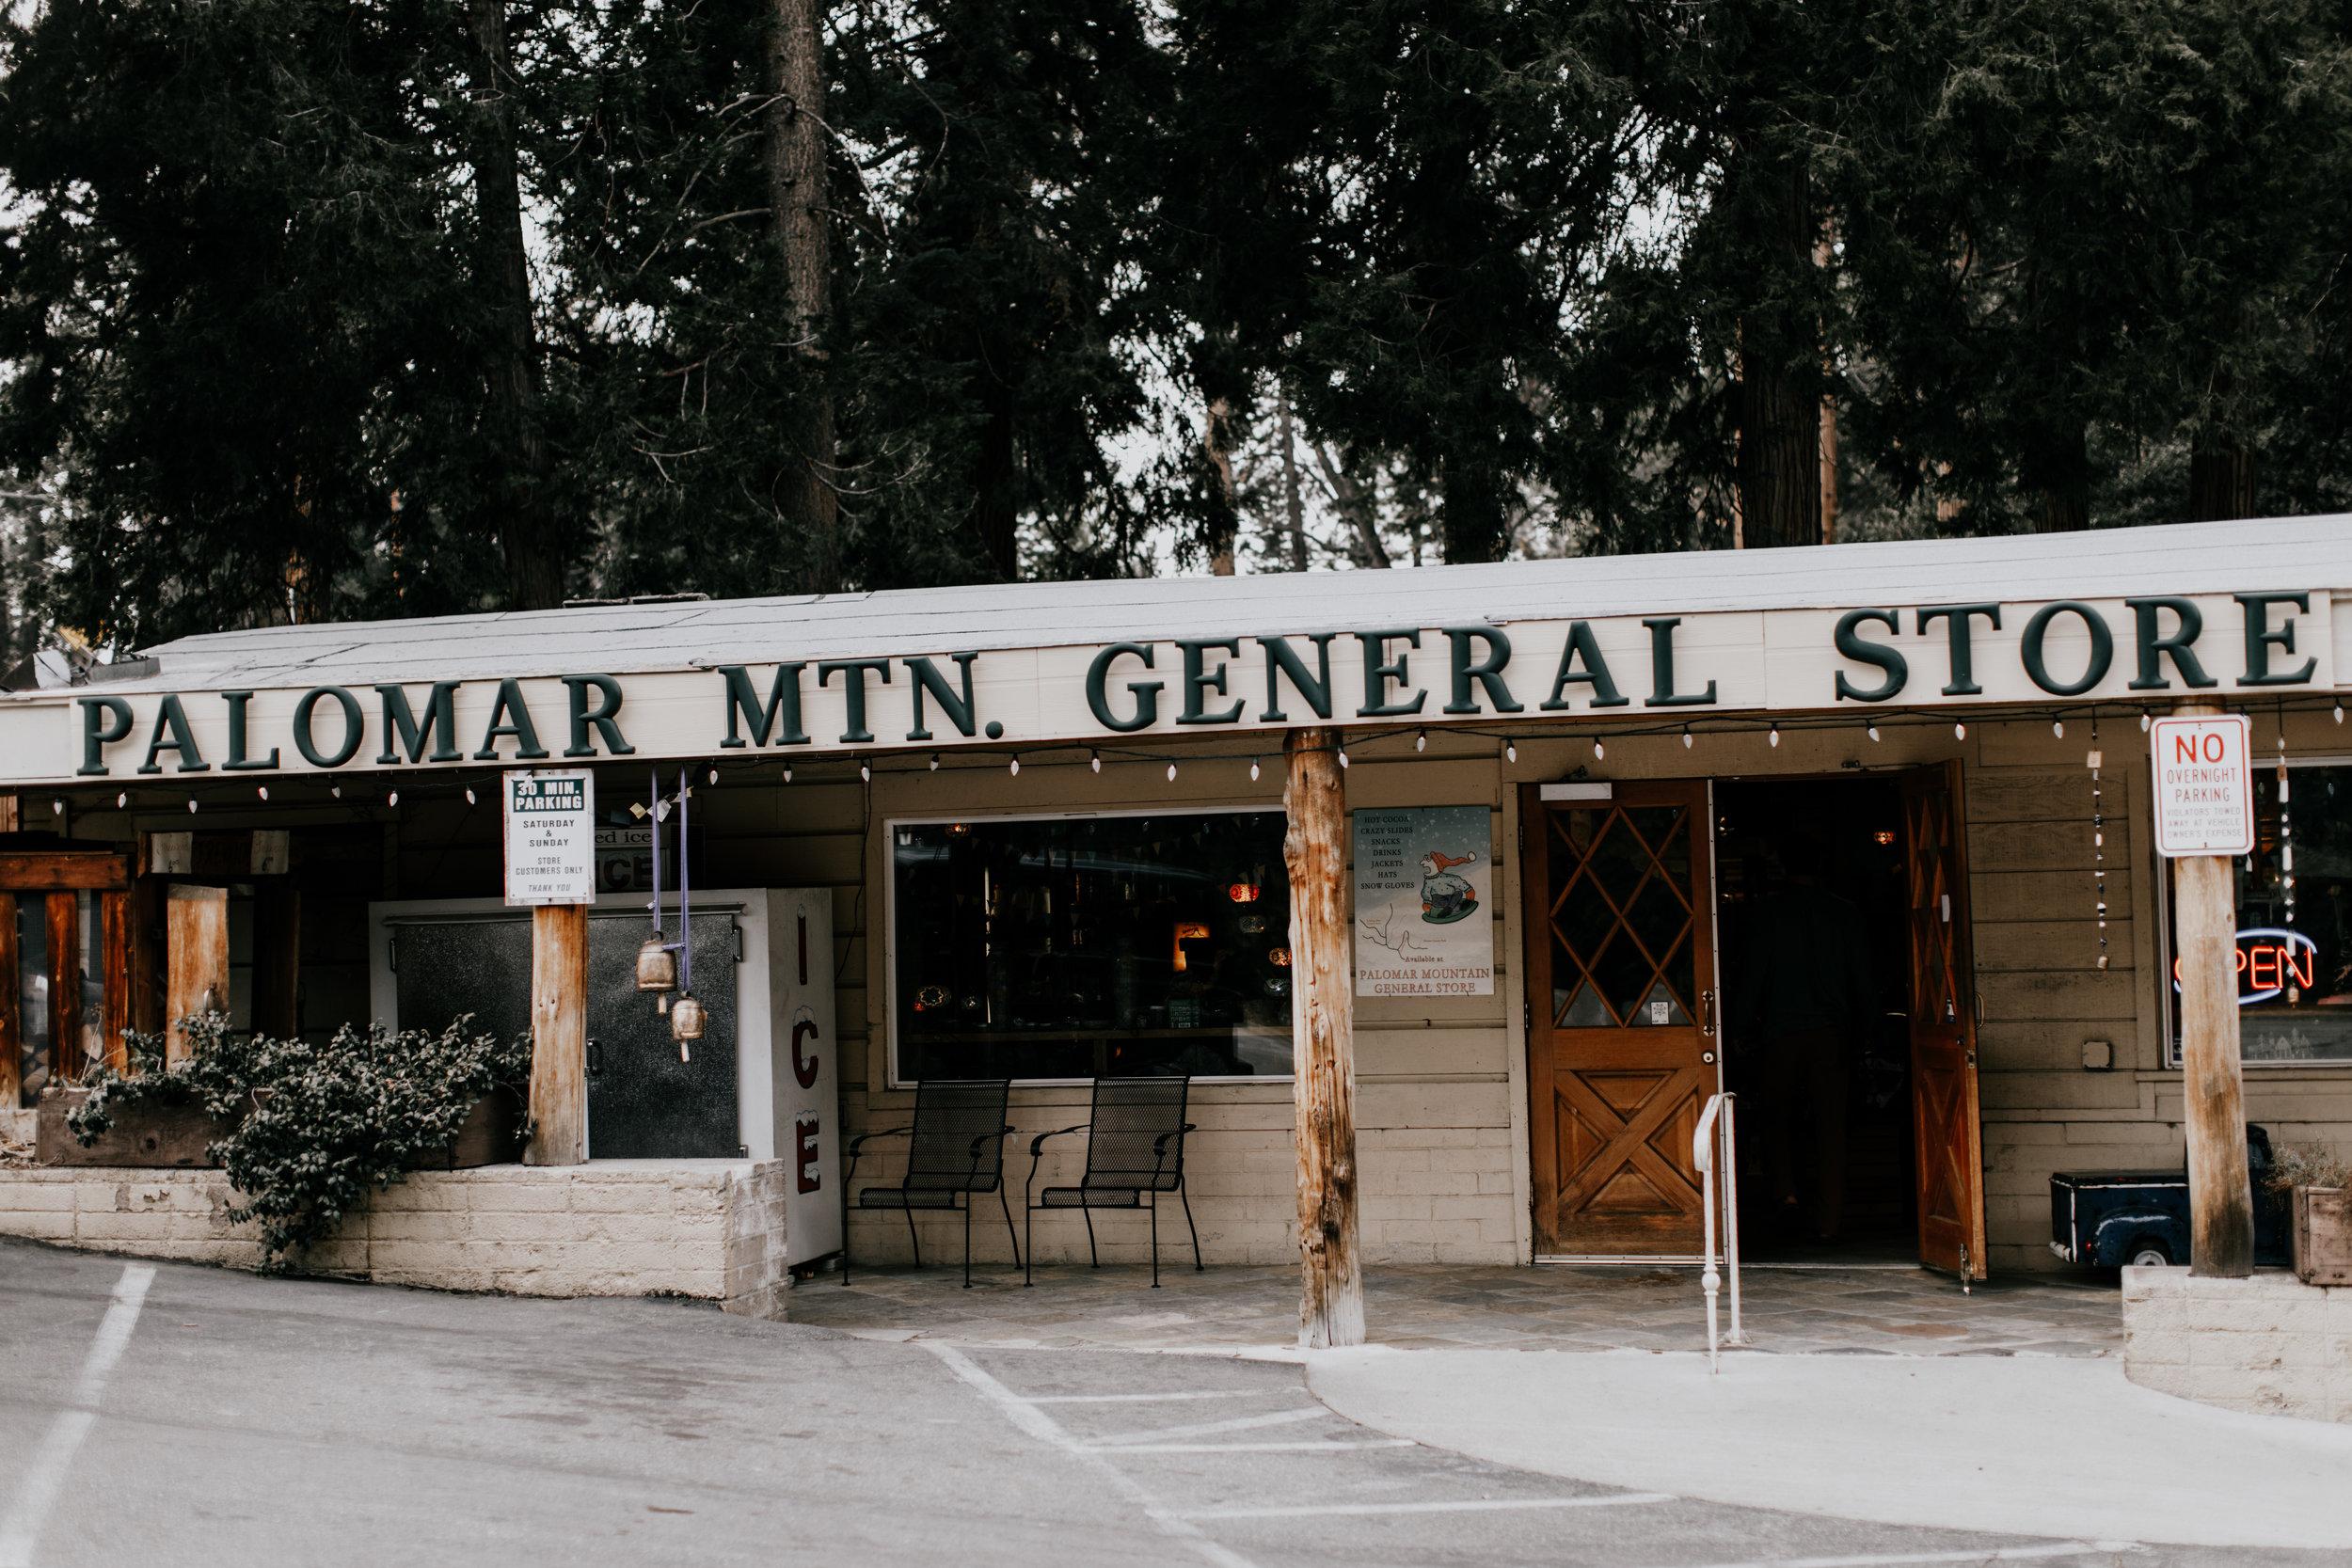 Palomar mountain store